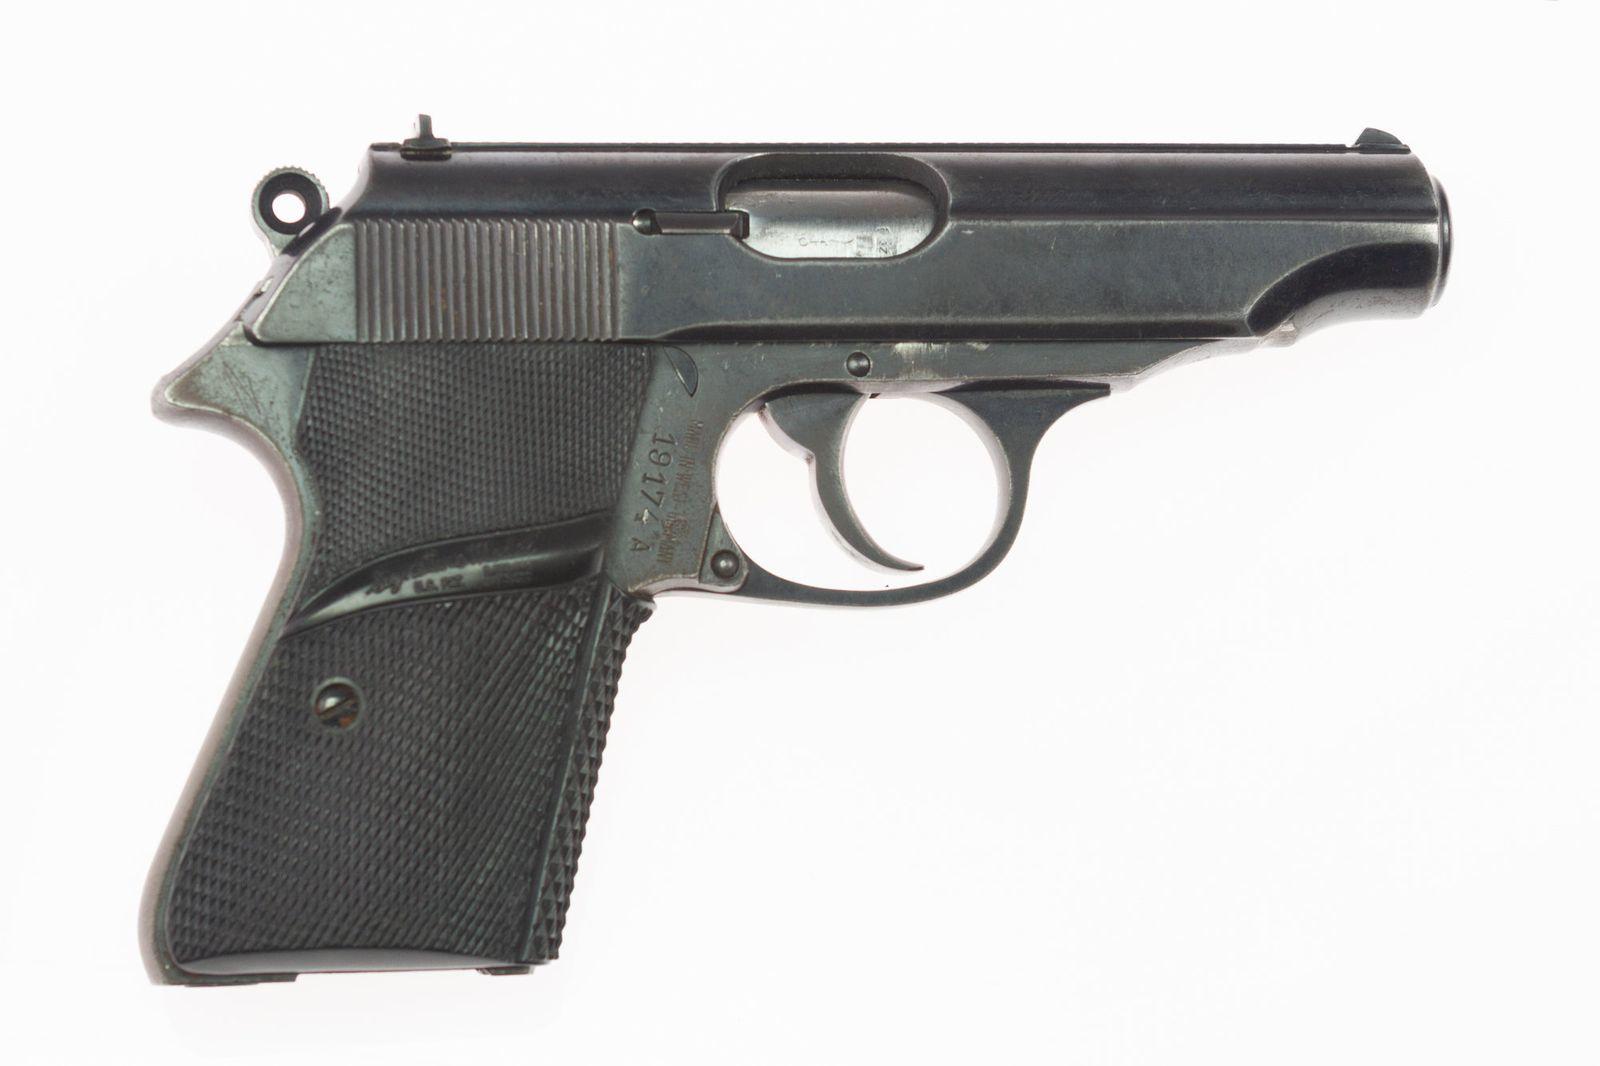 Bond-Pistole wird versteigert